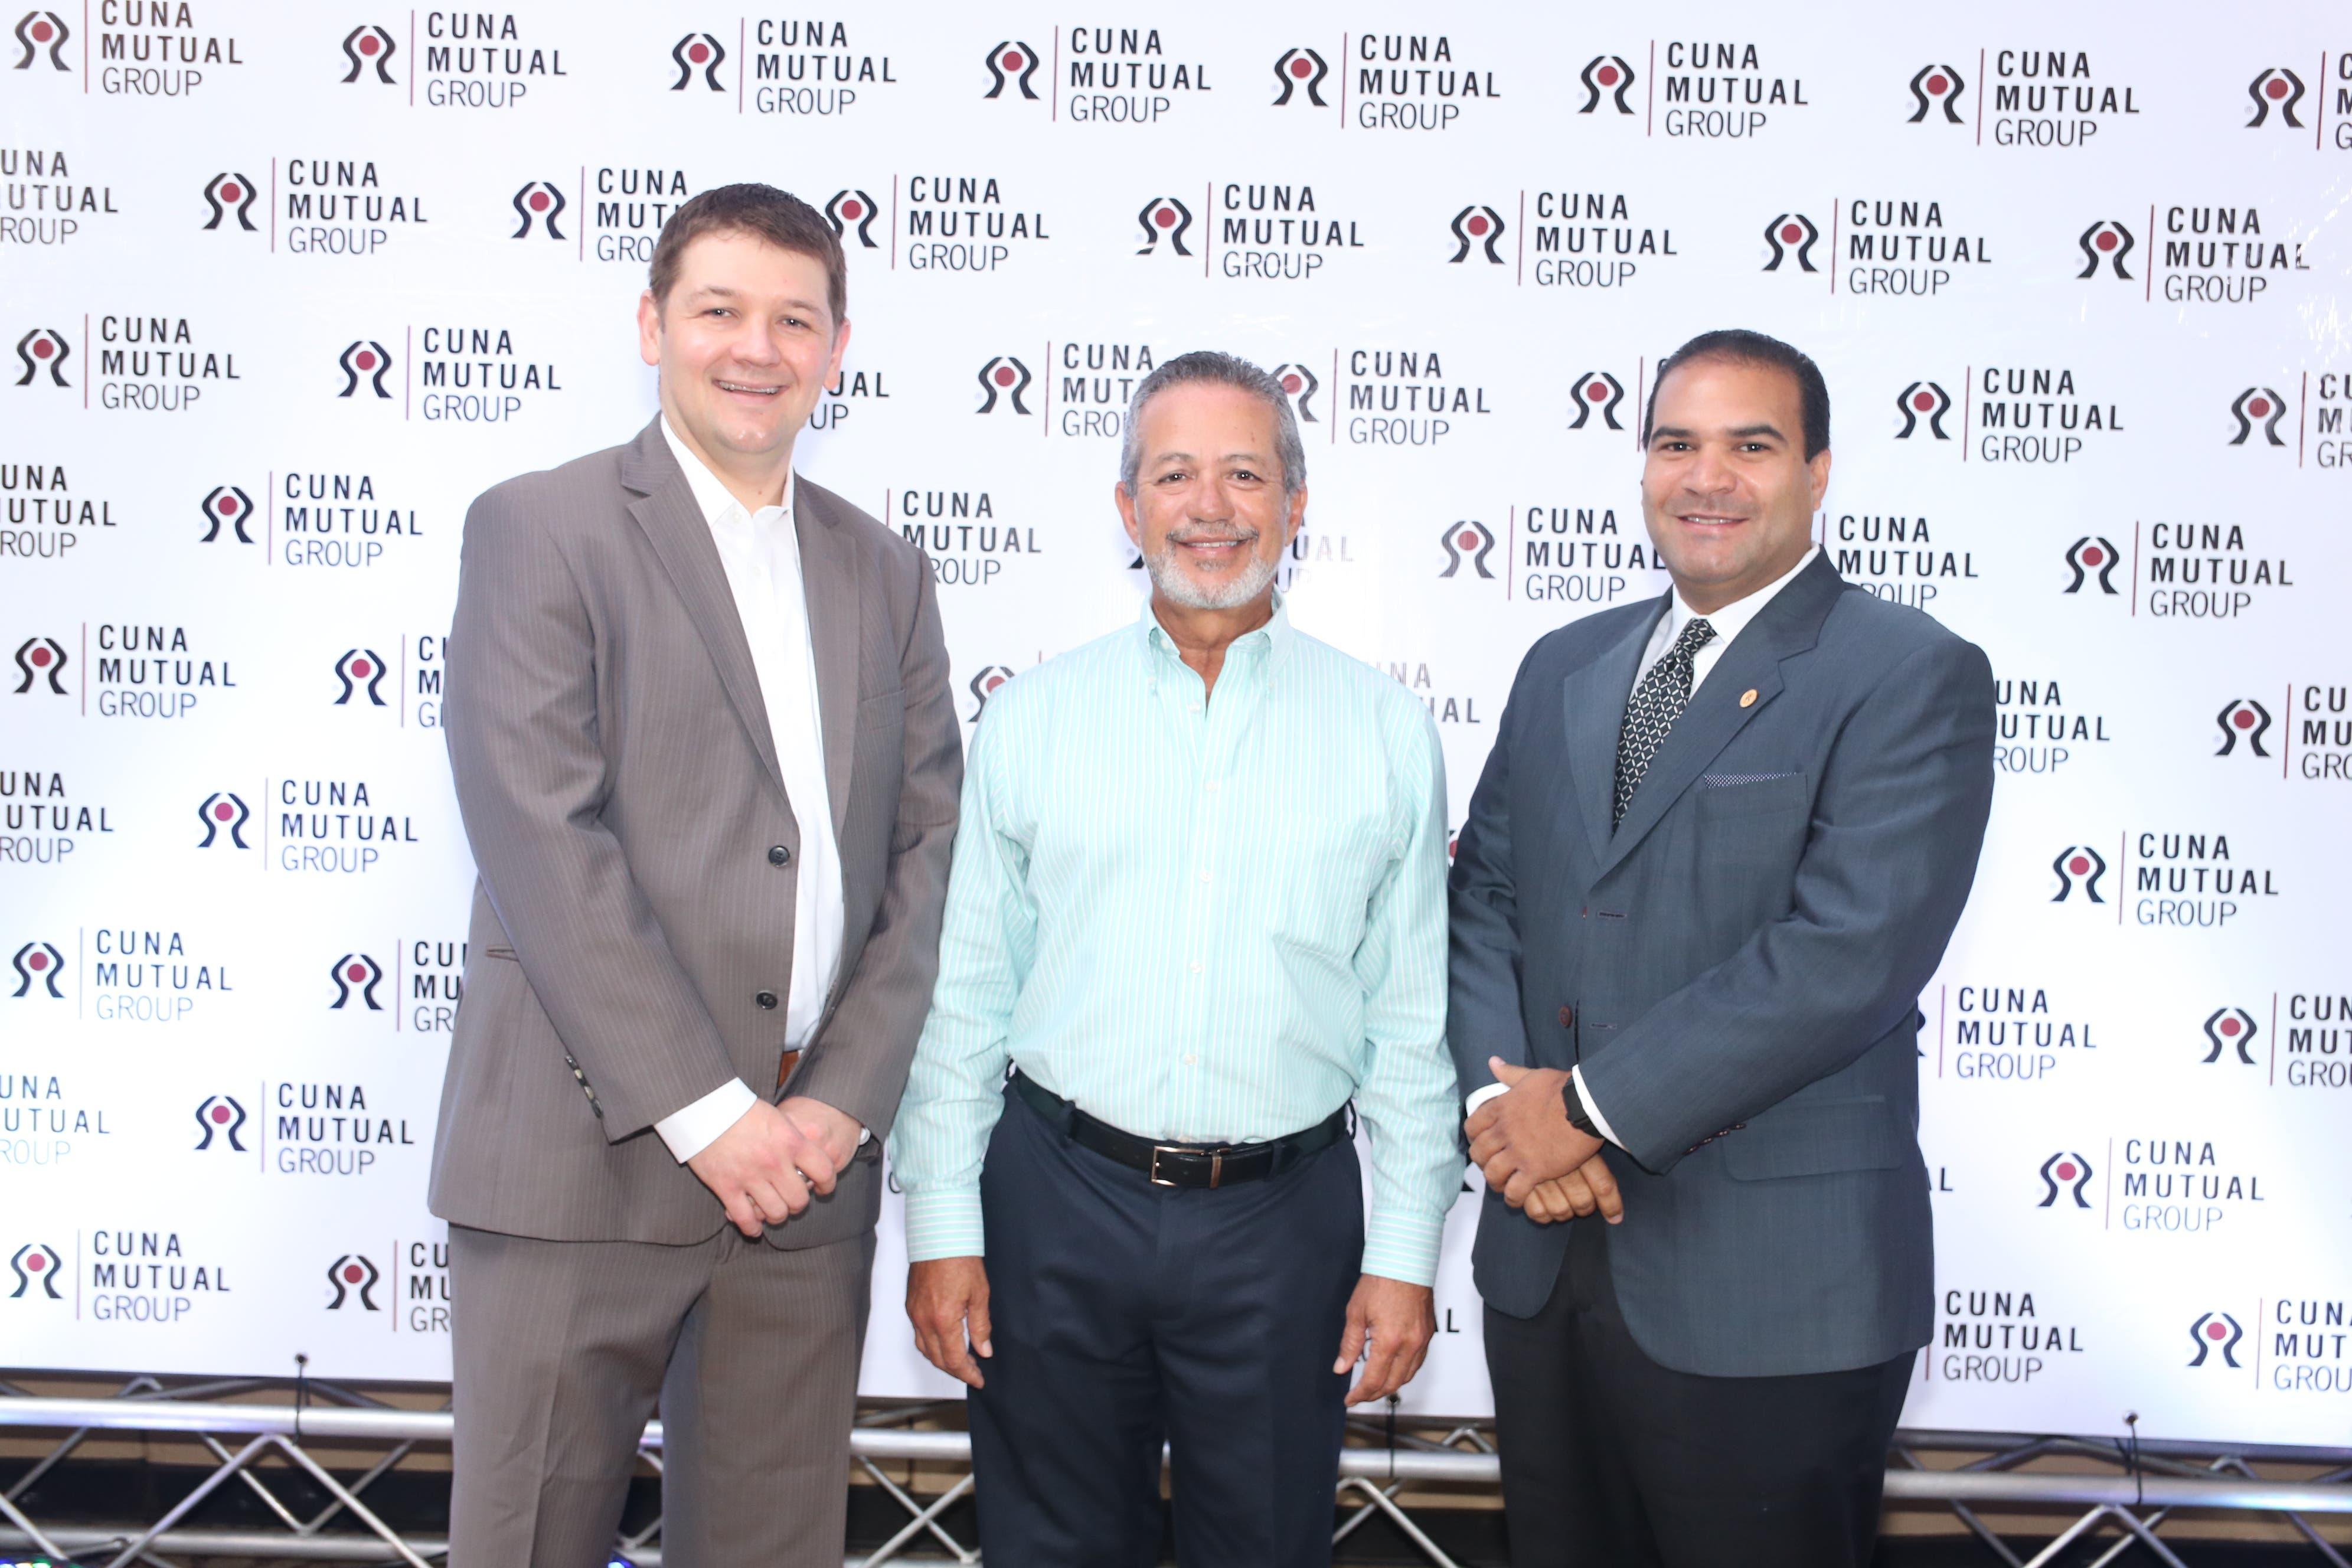 CUNA Mutual Group reembolsa $11.1 millones a cooperativas